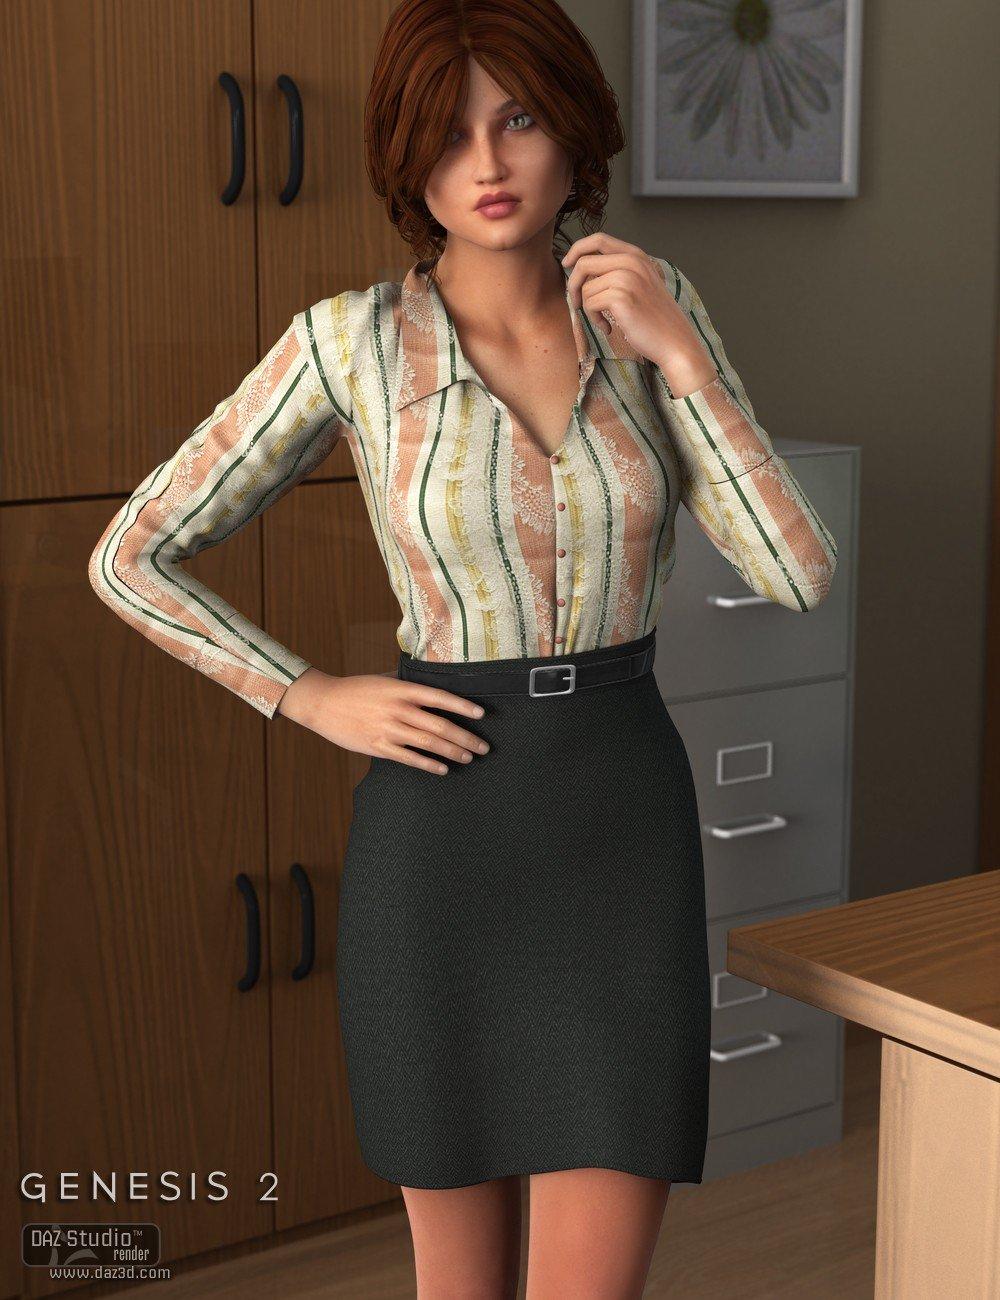 Workday Dress 2 for Genesis 2 Female(s)_DAZ3D下载站